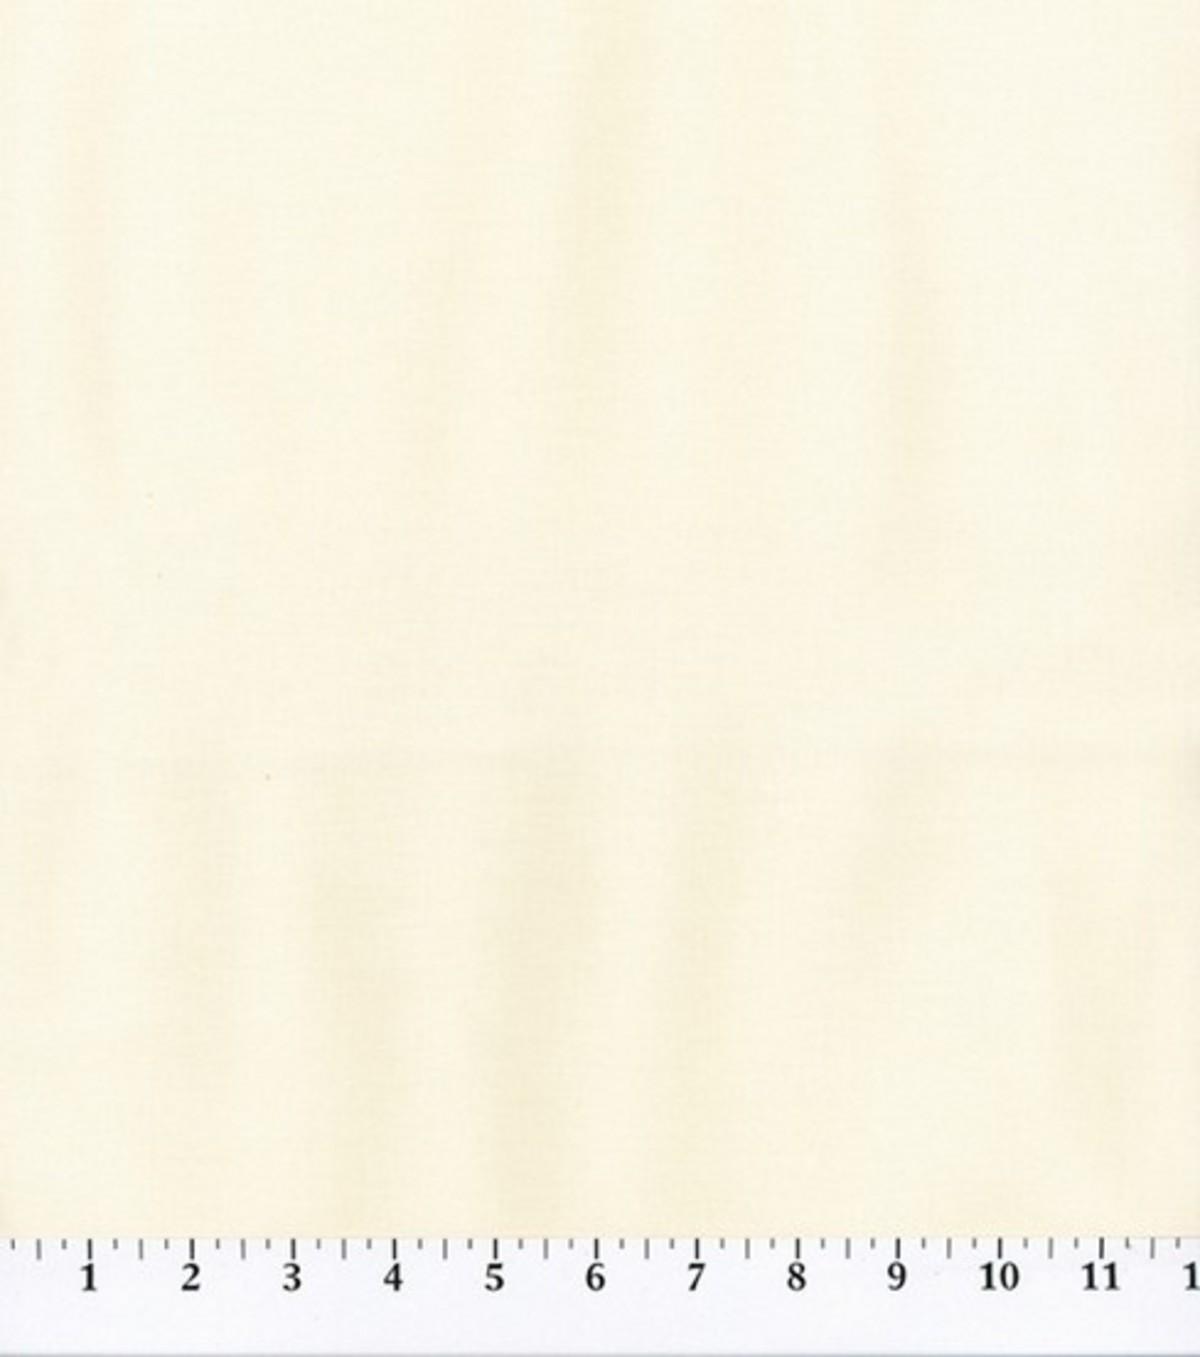 9514810a7d9 Kona Quilt Cotton Fabric -Solids